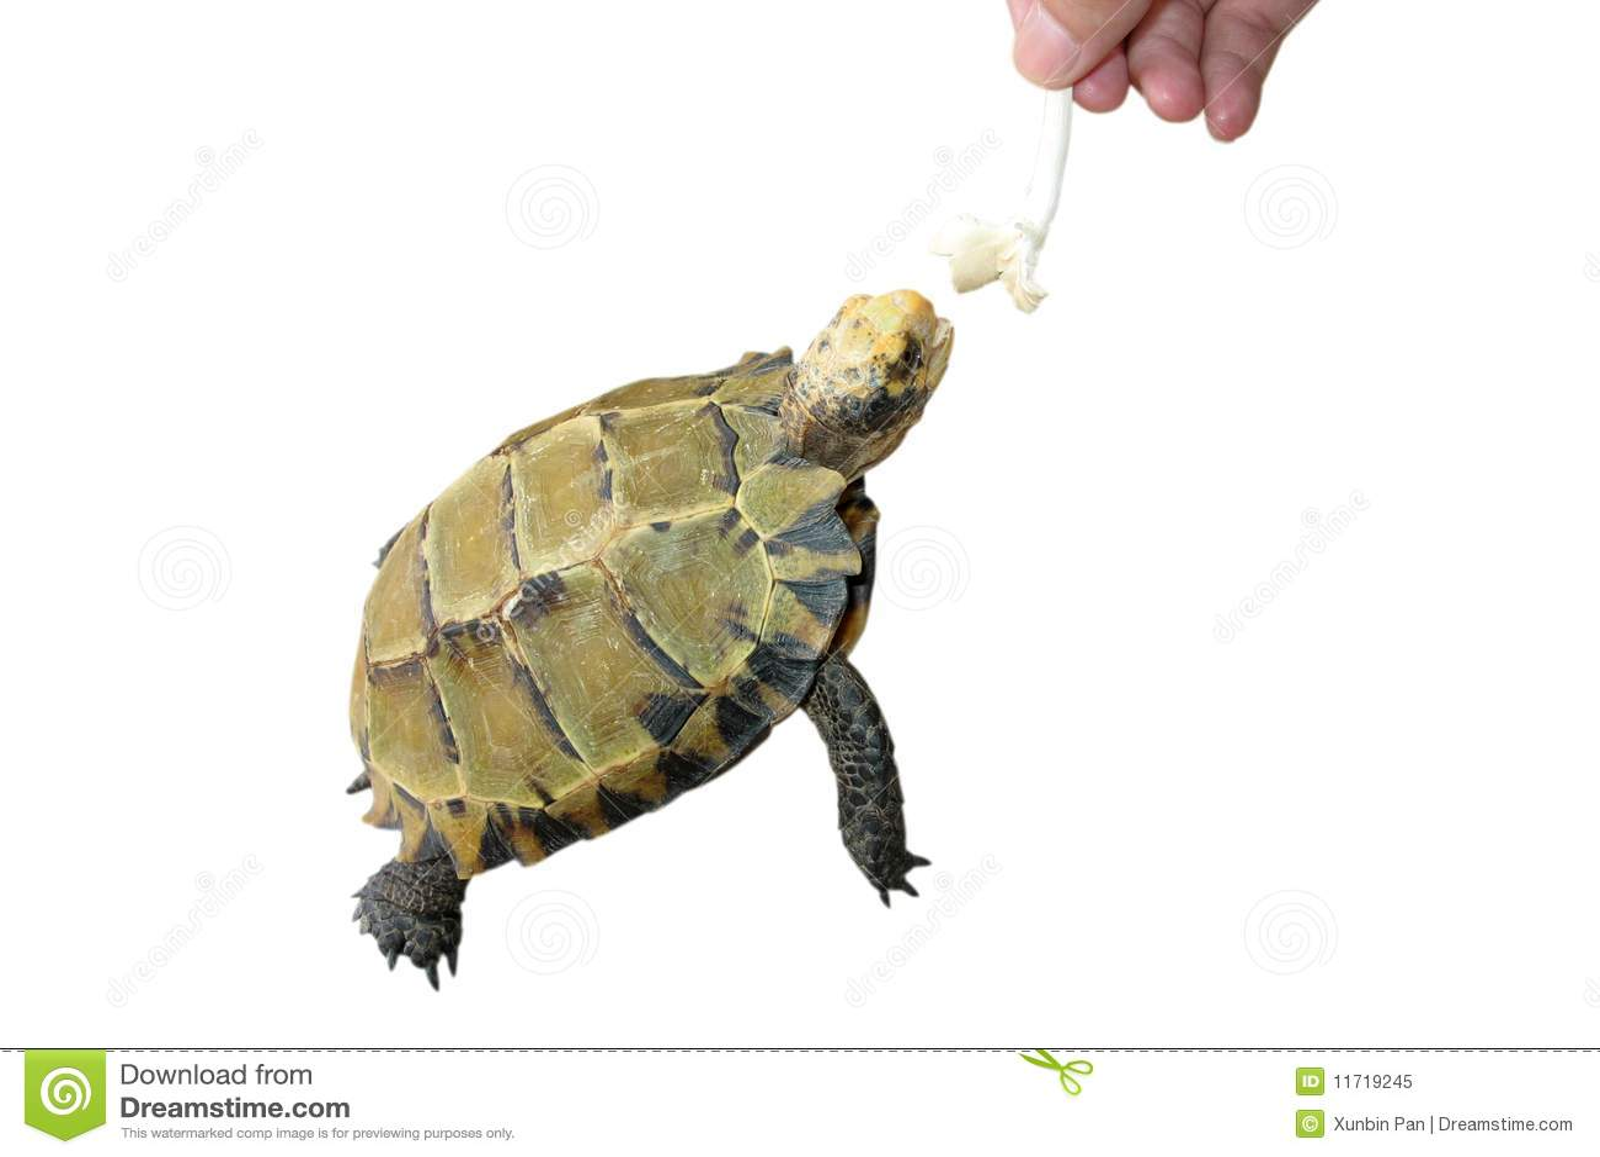 Pet Turtle Feeding Royalty Free Stock Photo - Image: 11719245